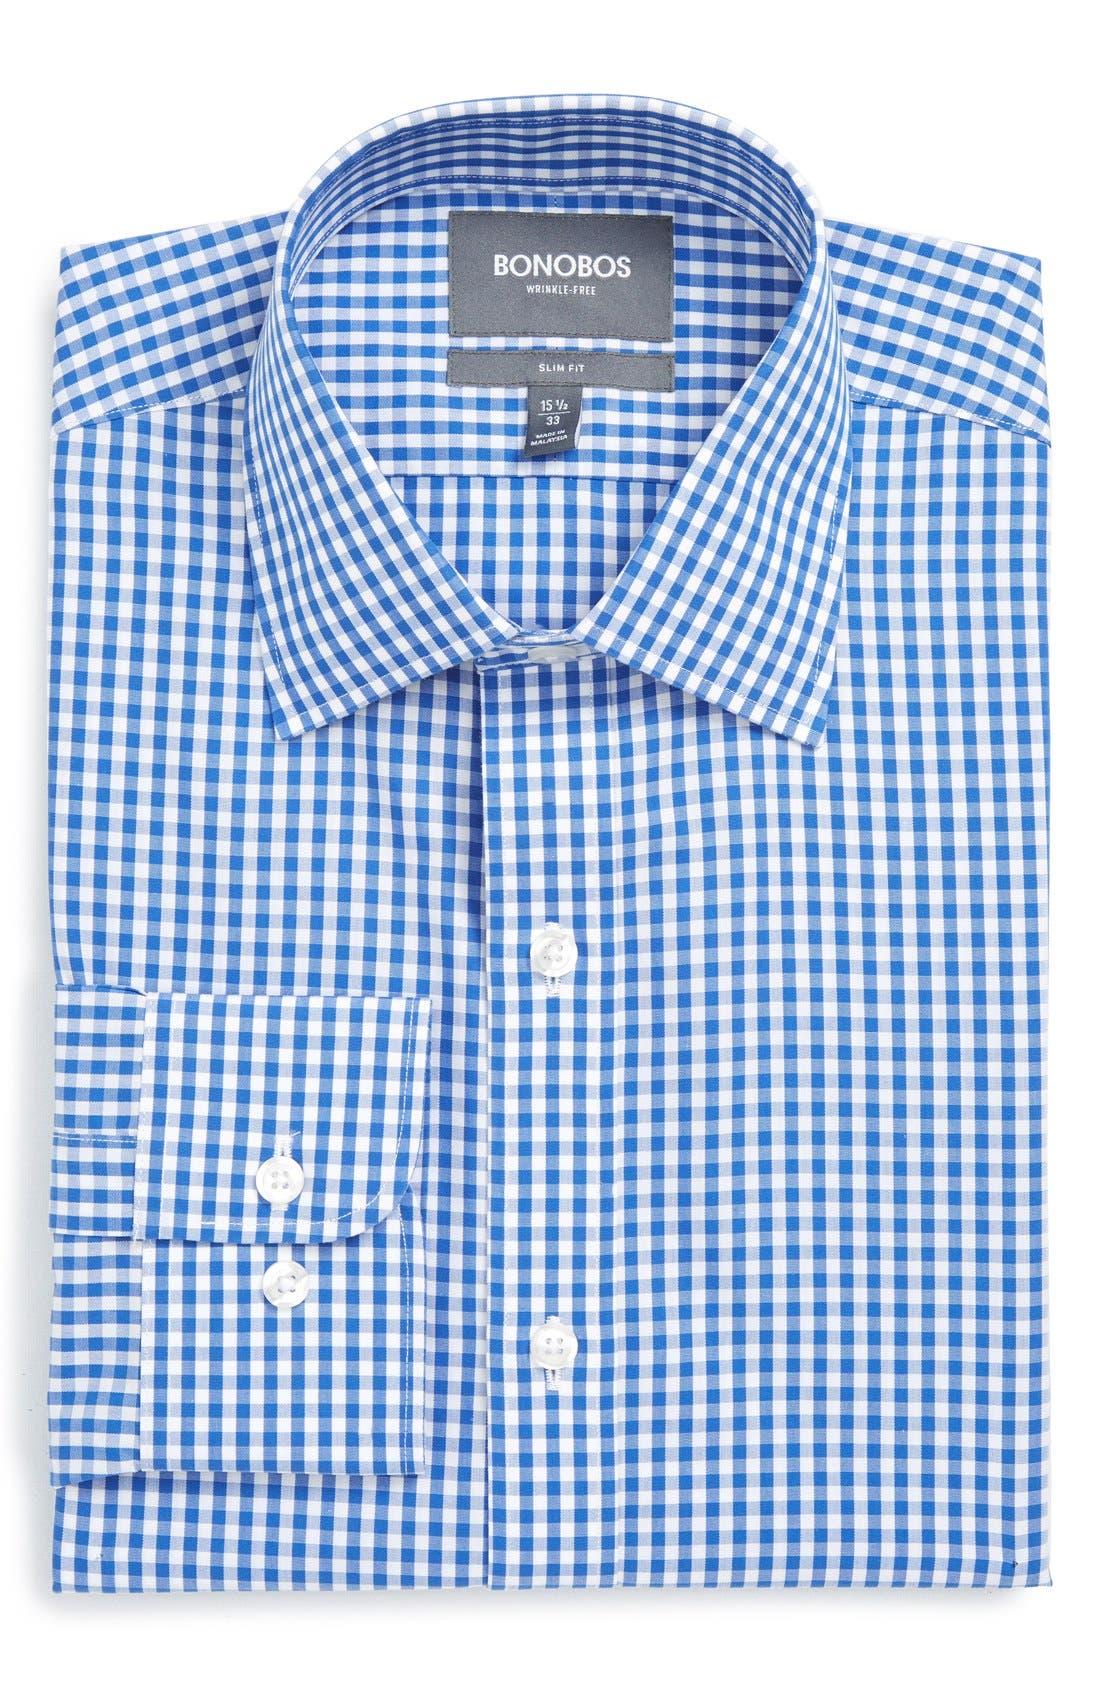 Slim Fit Wrinkle Free Check Dress Shirt,                             Main thumbnail 1, color,                             BAY BLUE